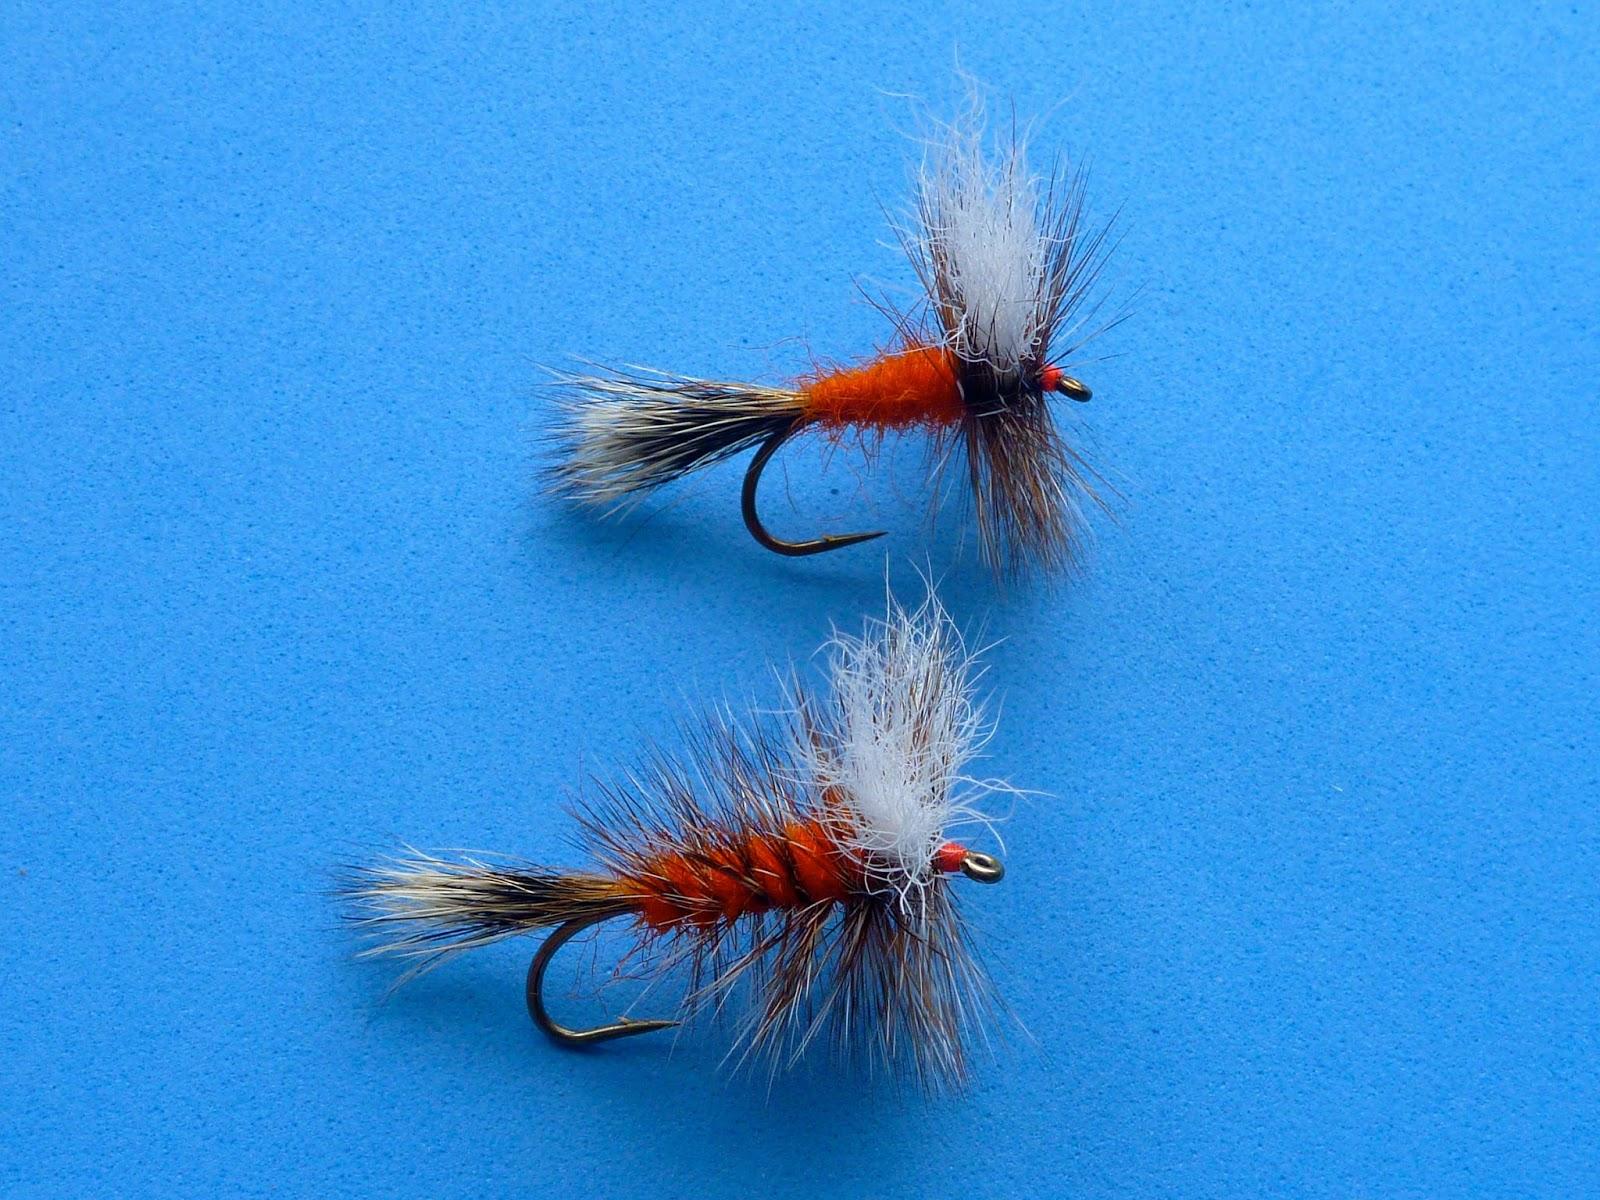 Atlantic Salmon Flies: March 2013 Atlantic Salmon Flies Patterns